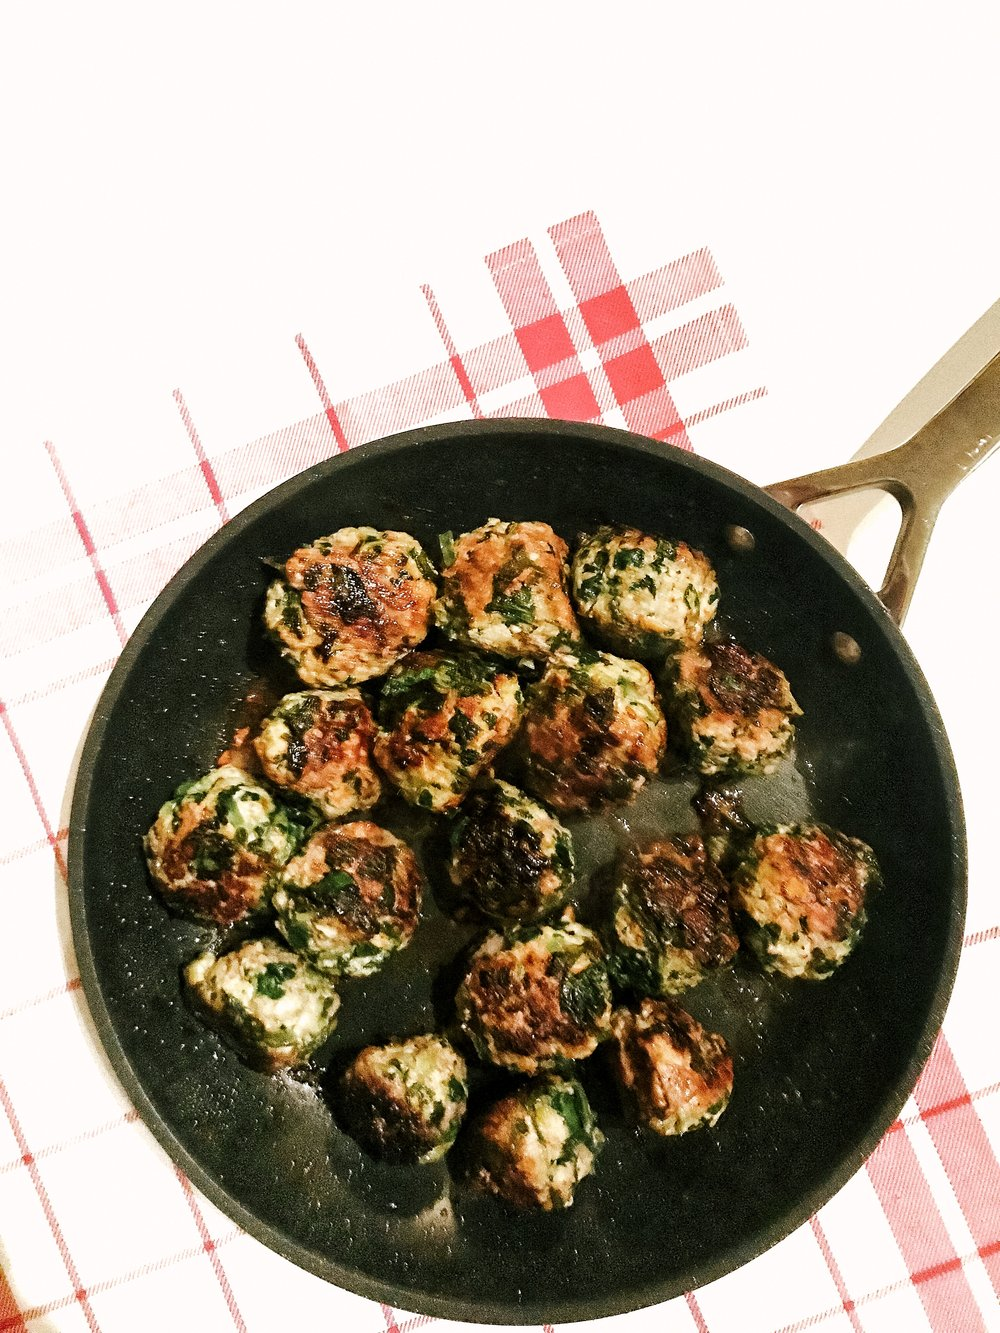 Chimichurri Meatballs (AIP, GAPS, Paleo, Gluten-Free, Dairy-Free, Egg-Free) - 30 minute dinner recipe